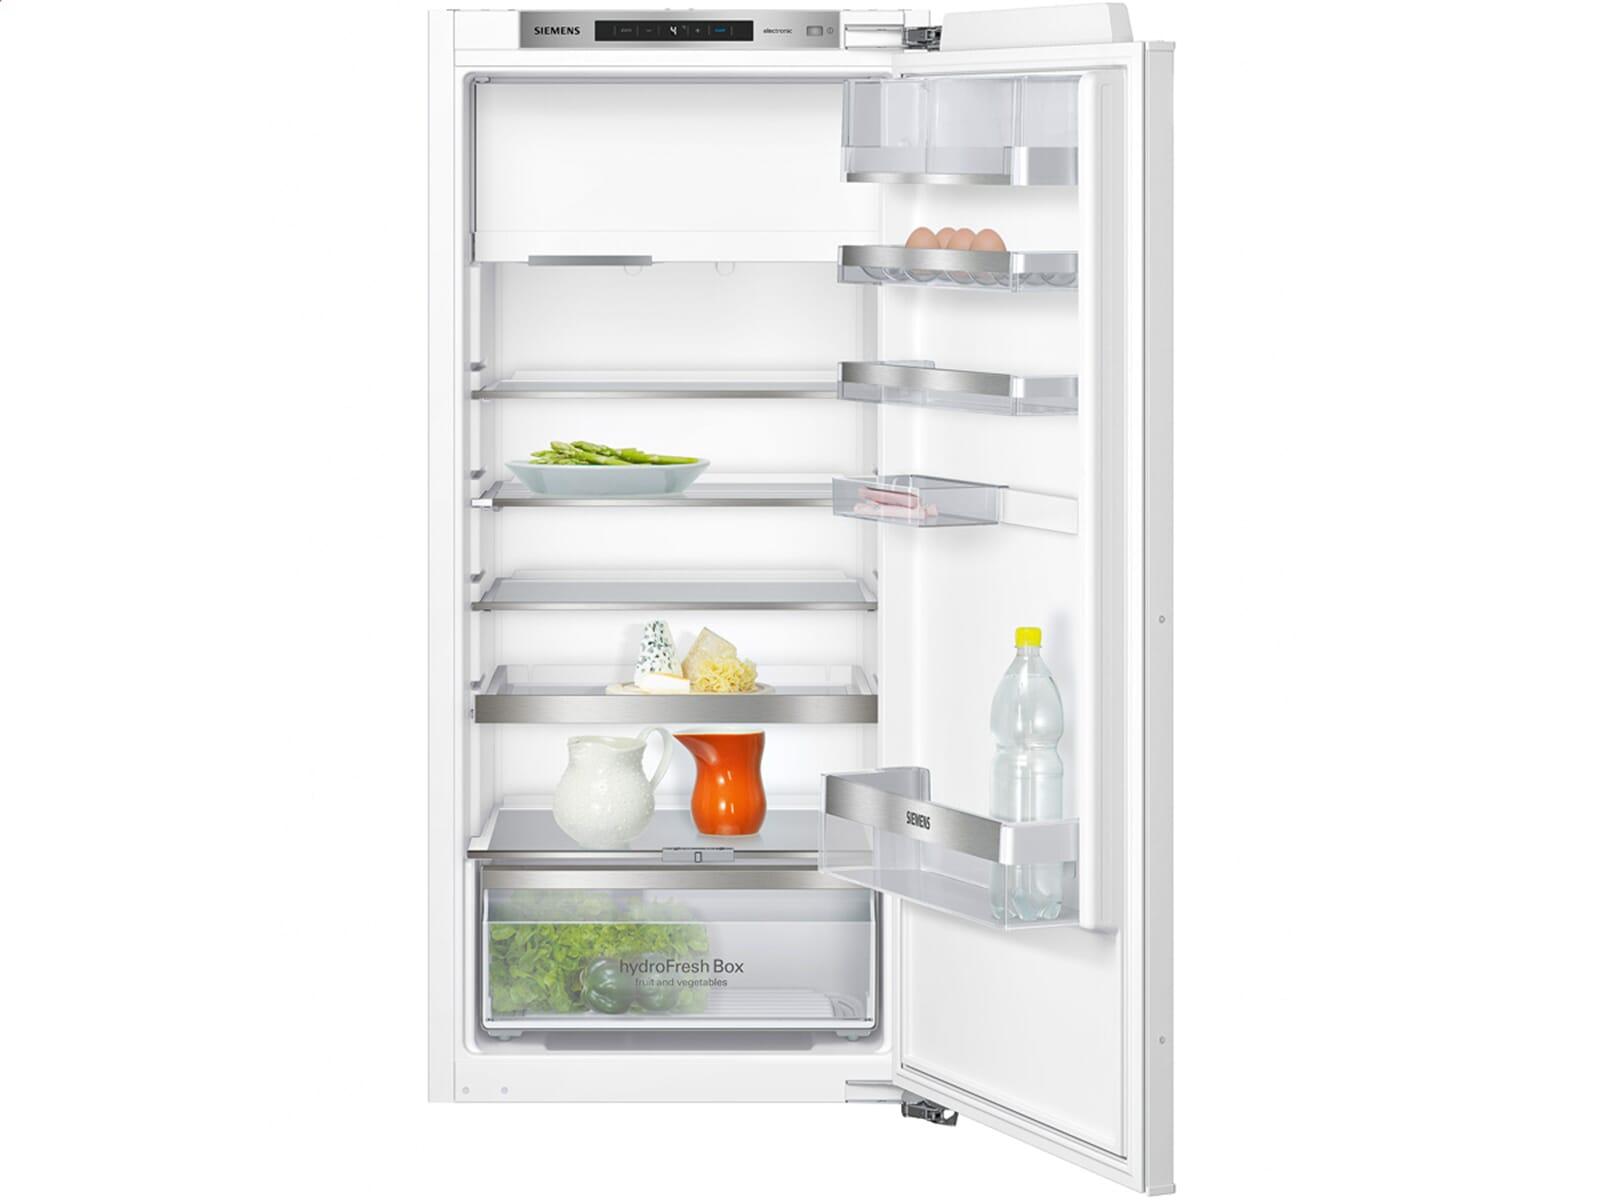 Siemens KI42LAD40 Einbaukühlschrank | moebelplus